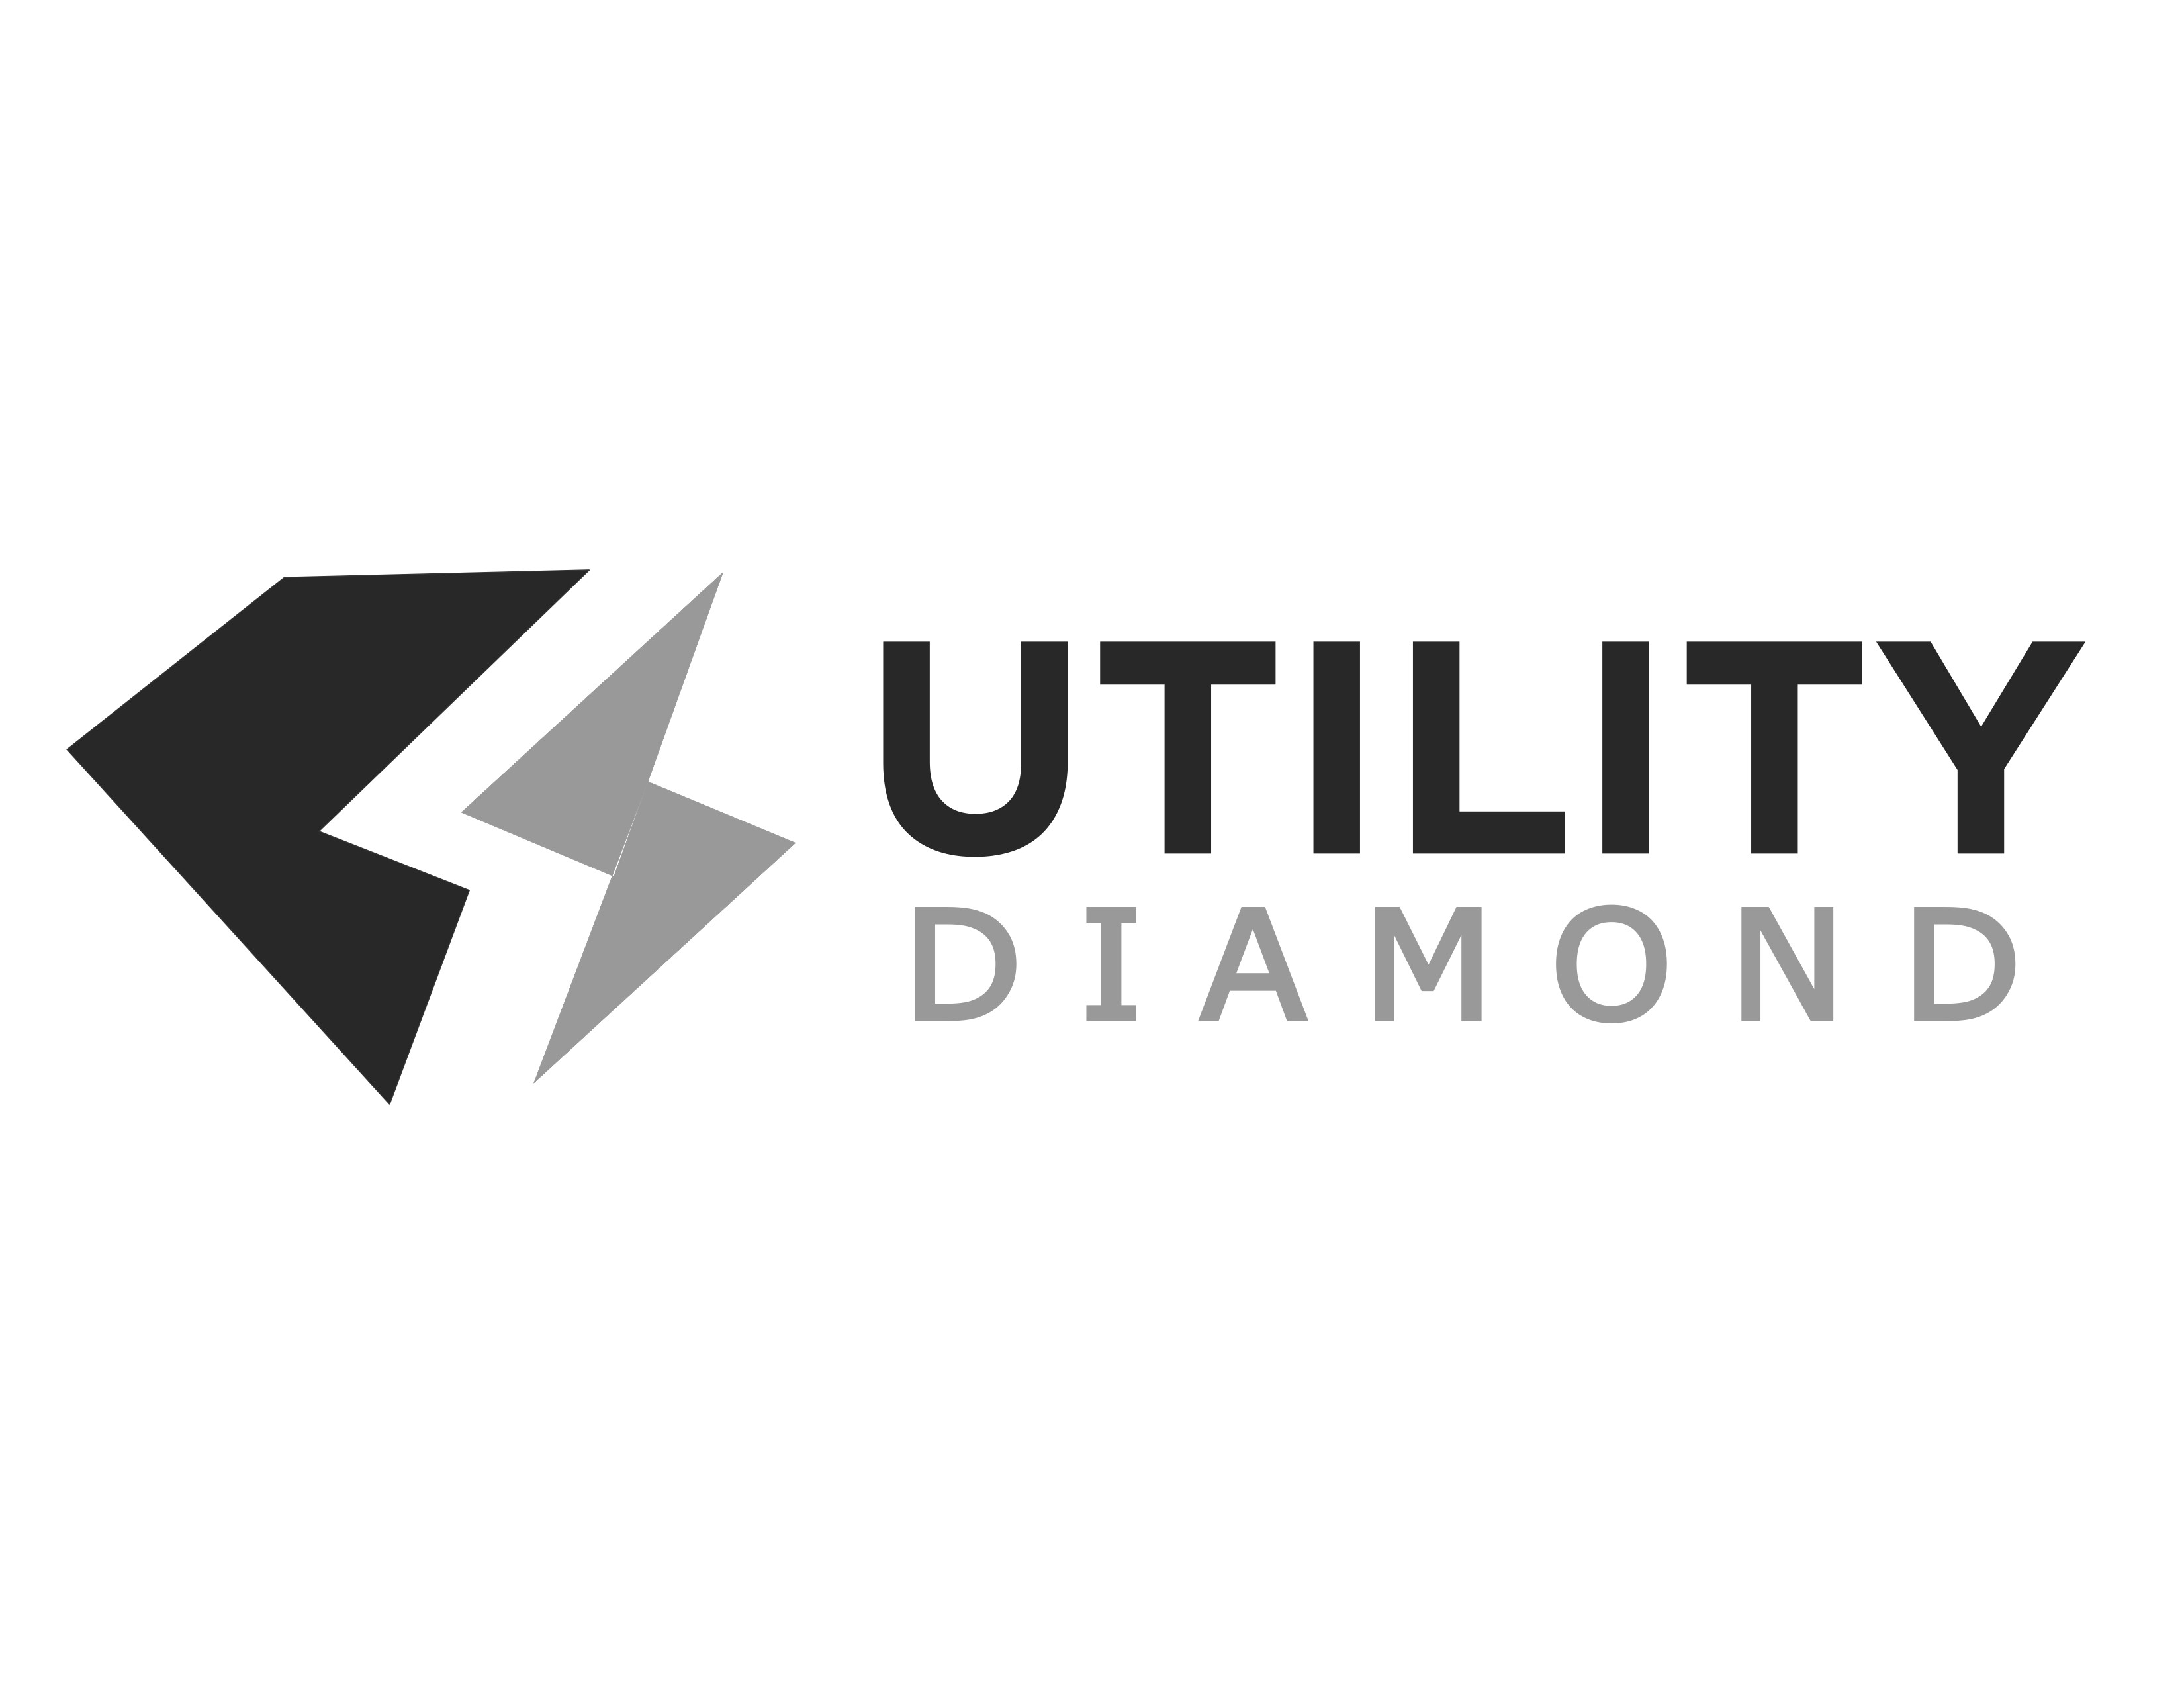 LOGO DESIGN FOR UTILITY DIAMOND